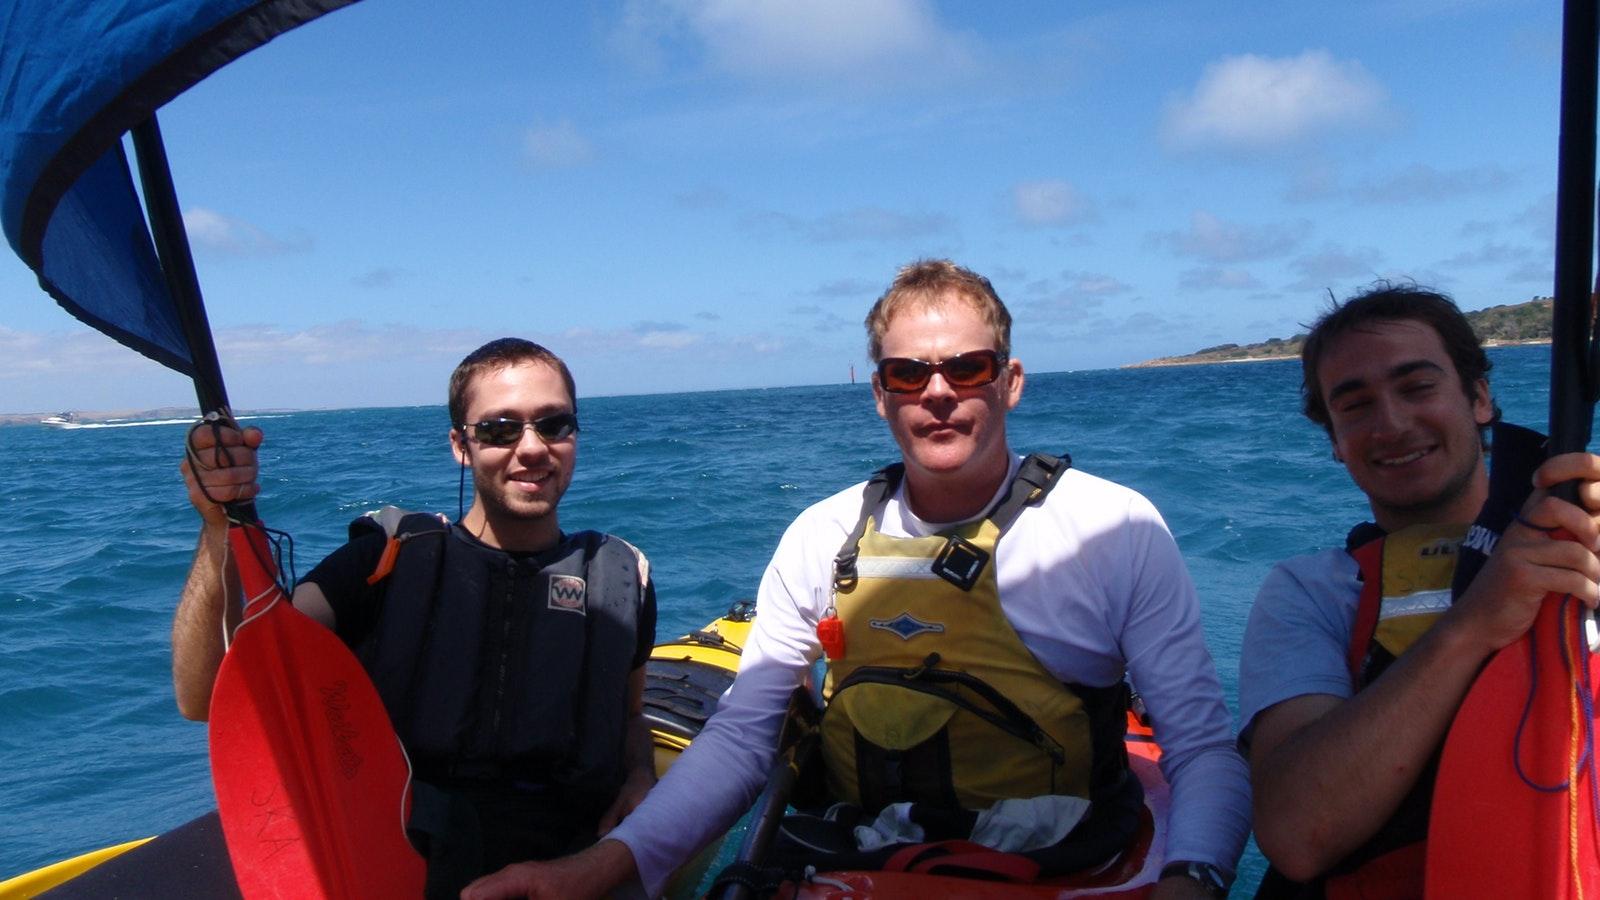 Sea kayaking and sailing Phillip island sea kayak day tour